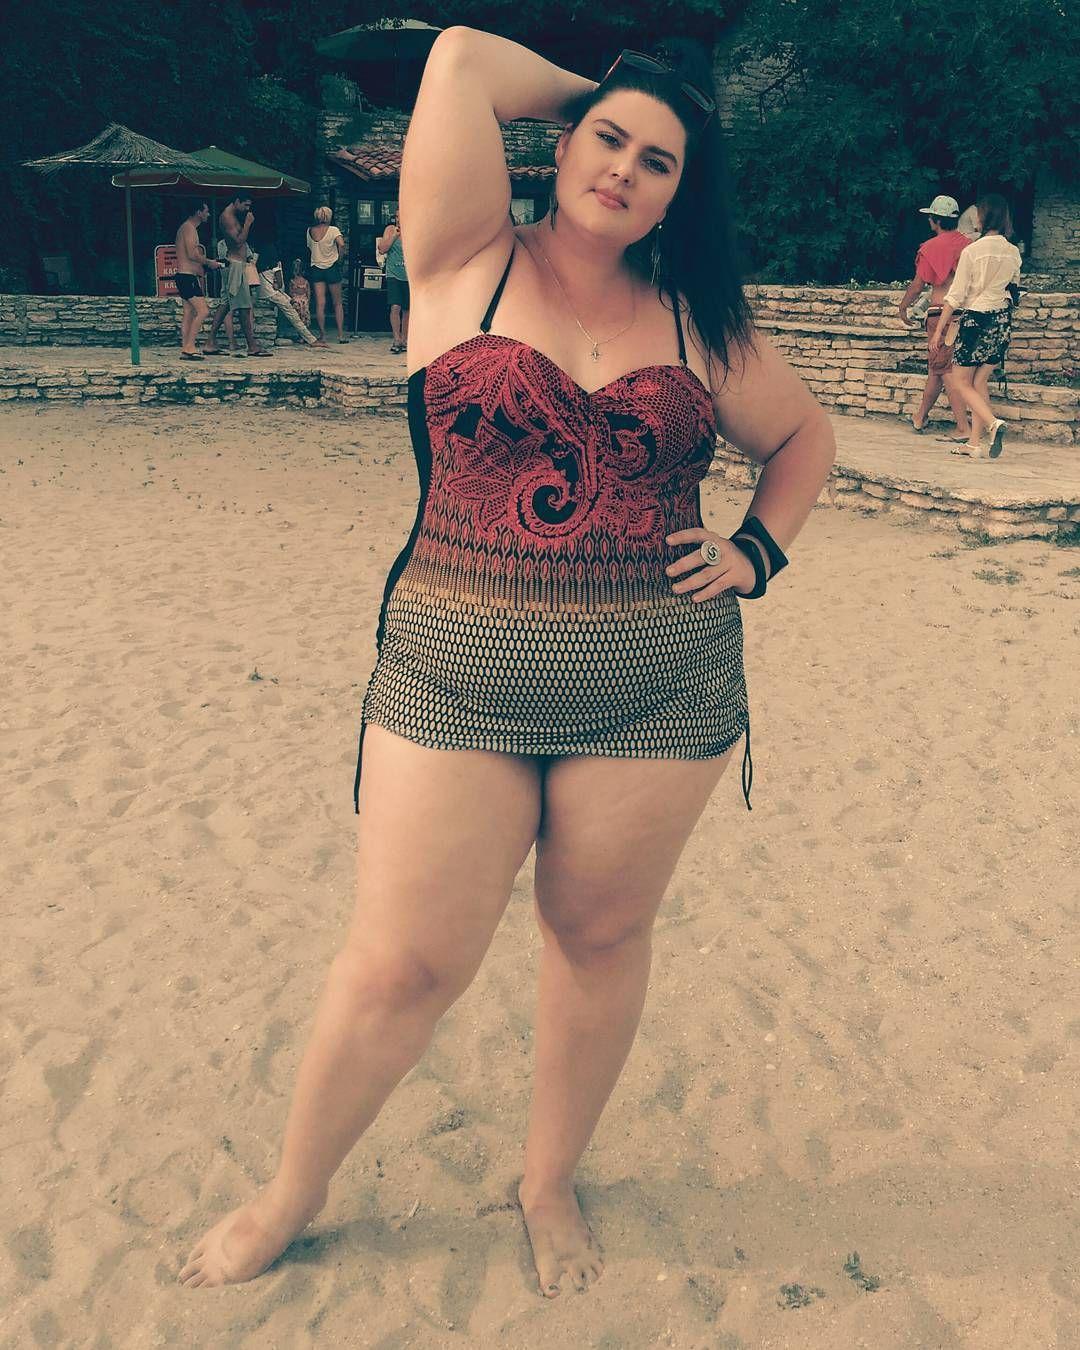 Bbw chubby sextures 12